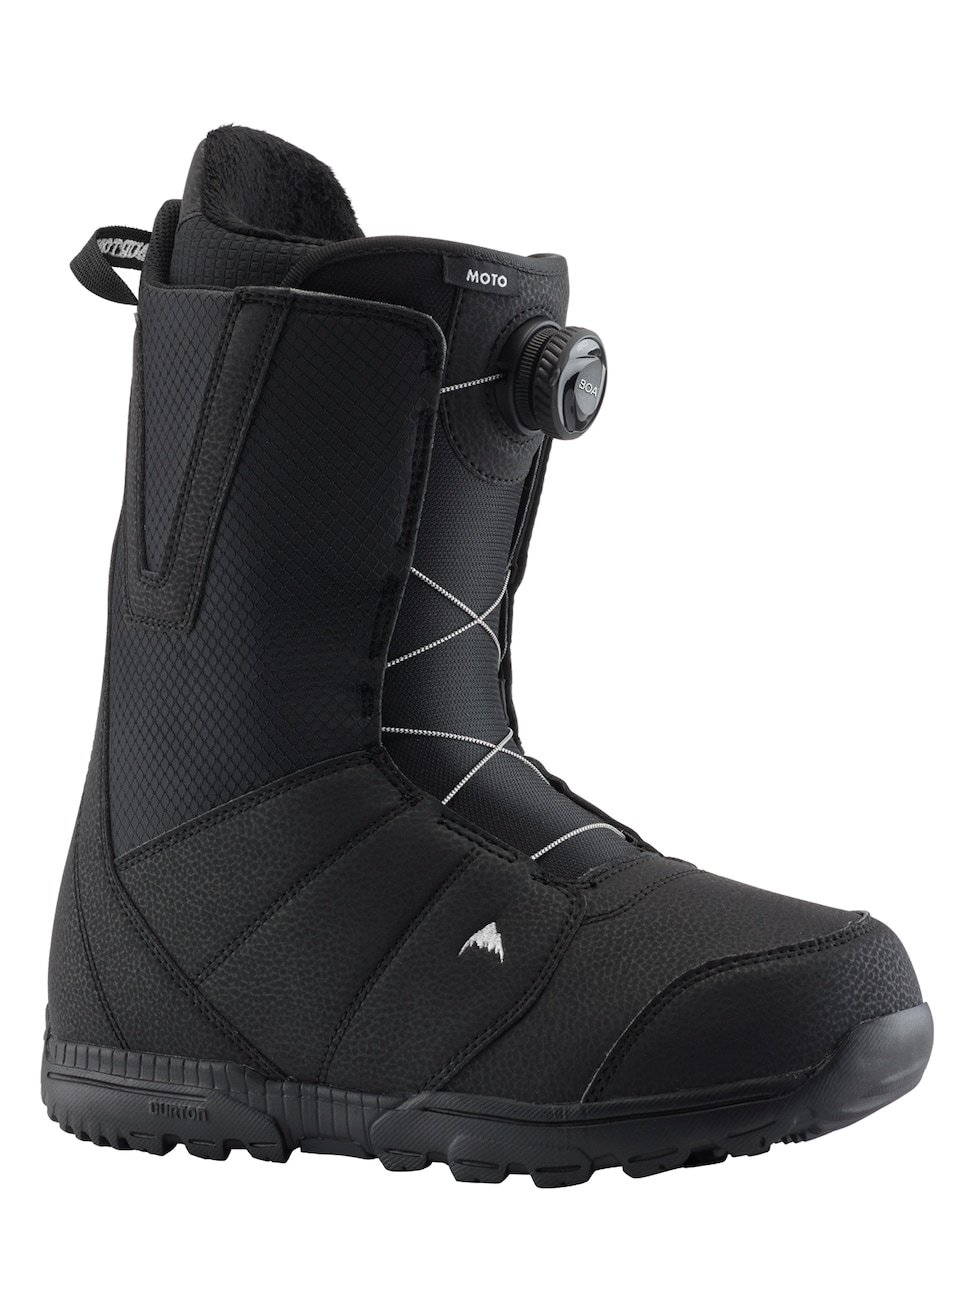 Burton MOTO BOA boots de Snowboard 2019-1